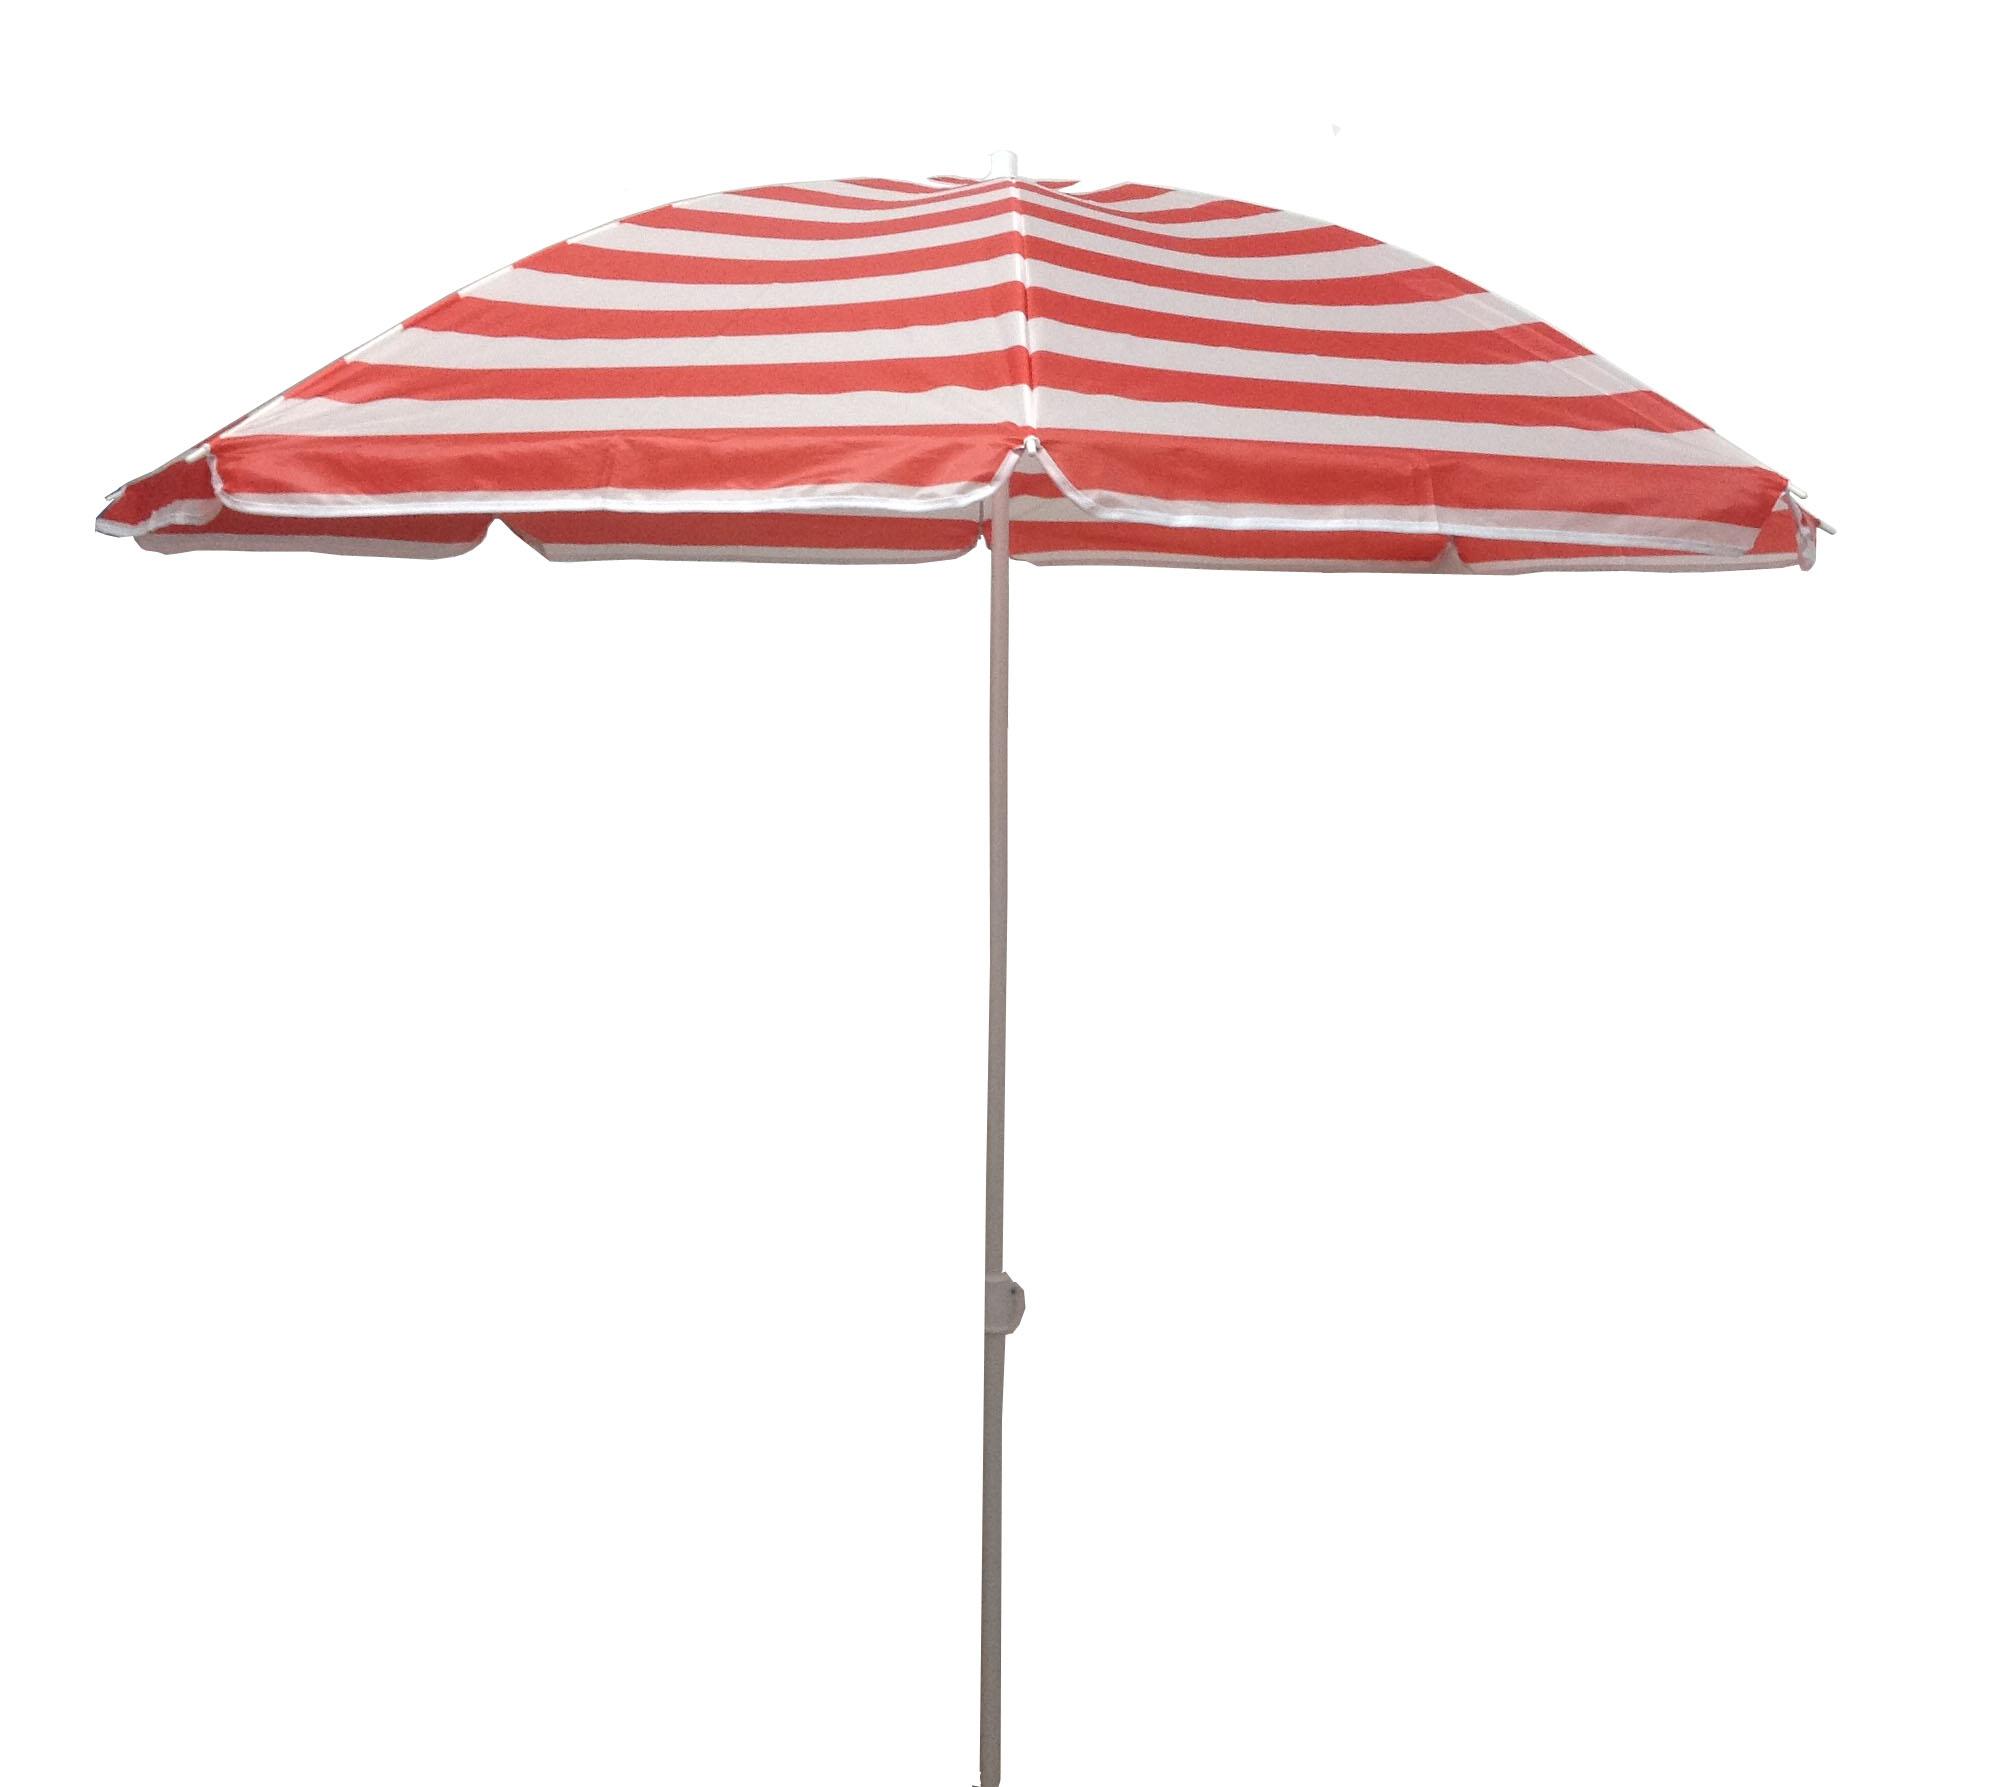 6 5 ft outdoor beach umbrella crimson stripe ebay. Black Bedroom Furniture Sets. Home Design Ideas